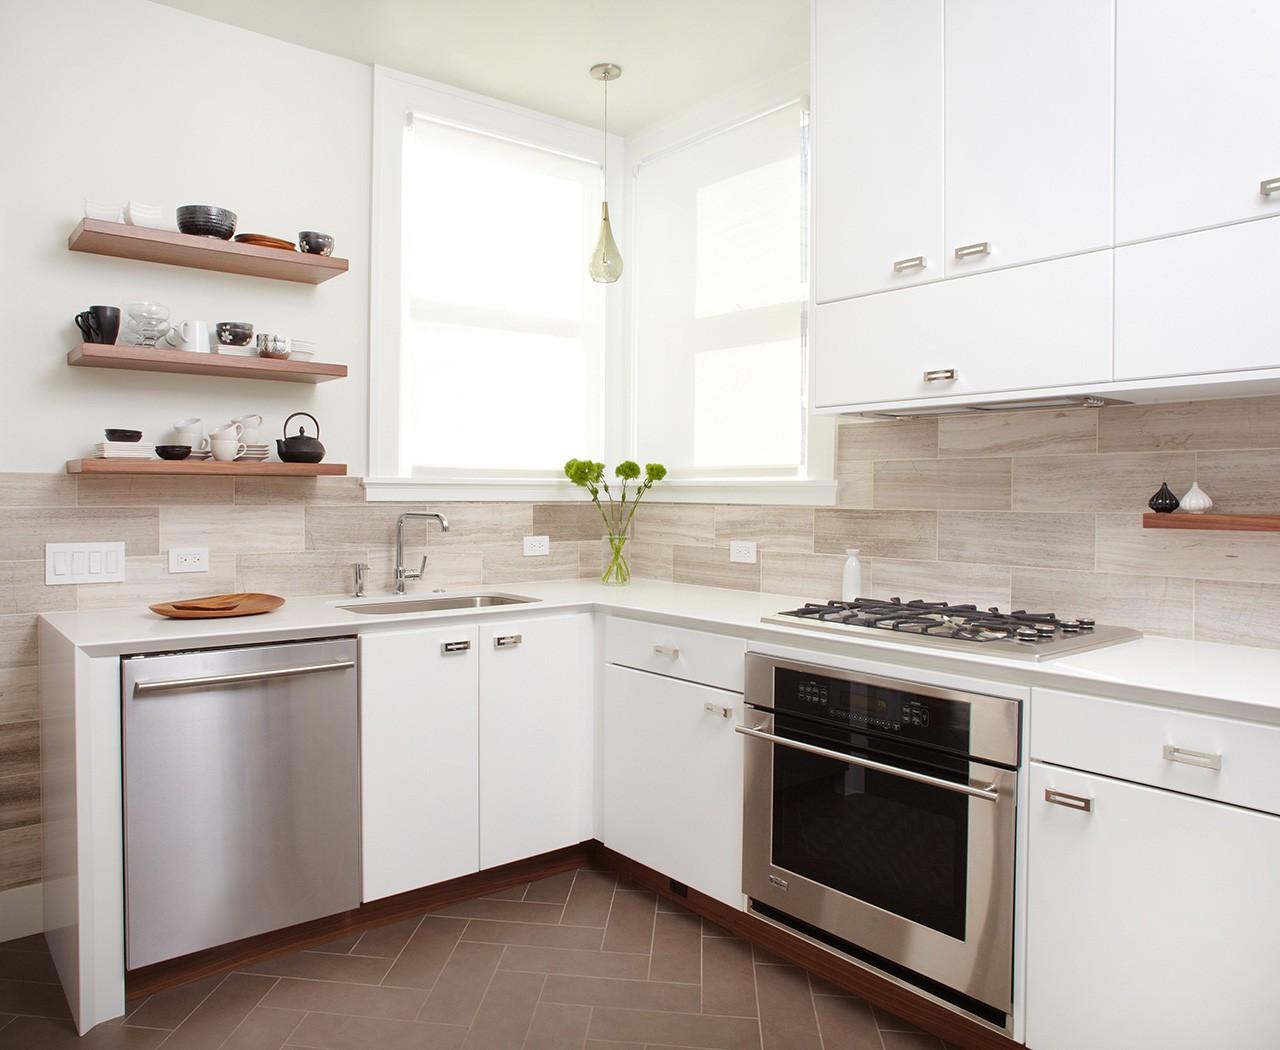 Praktické Rady Pro Malou Kuchyň Perfect Home